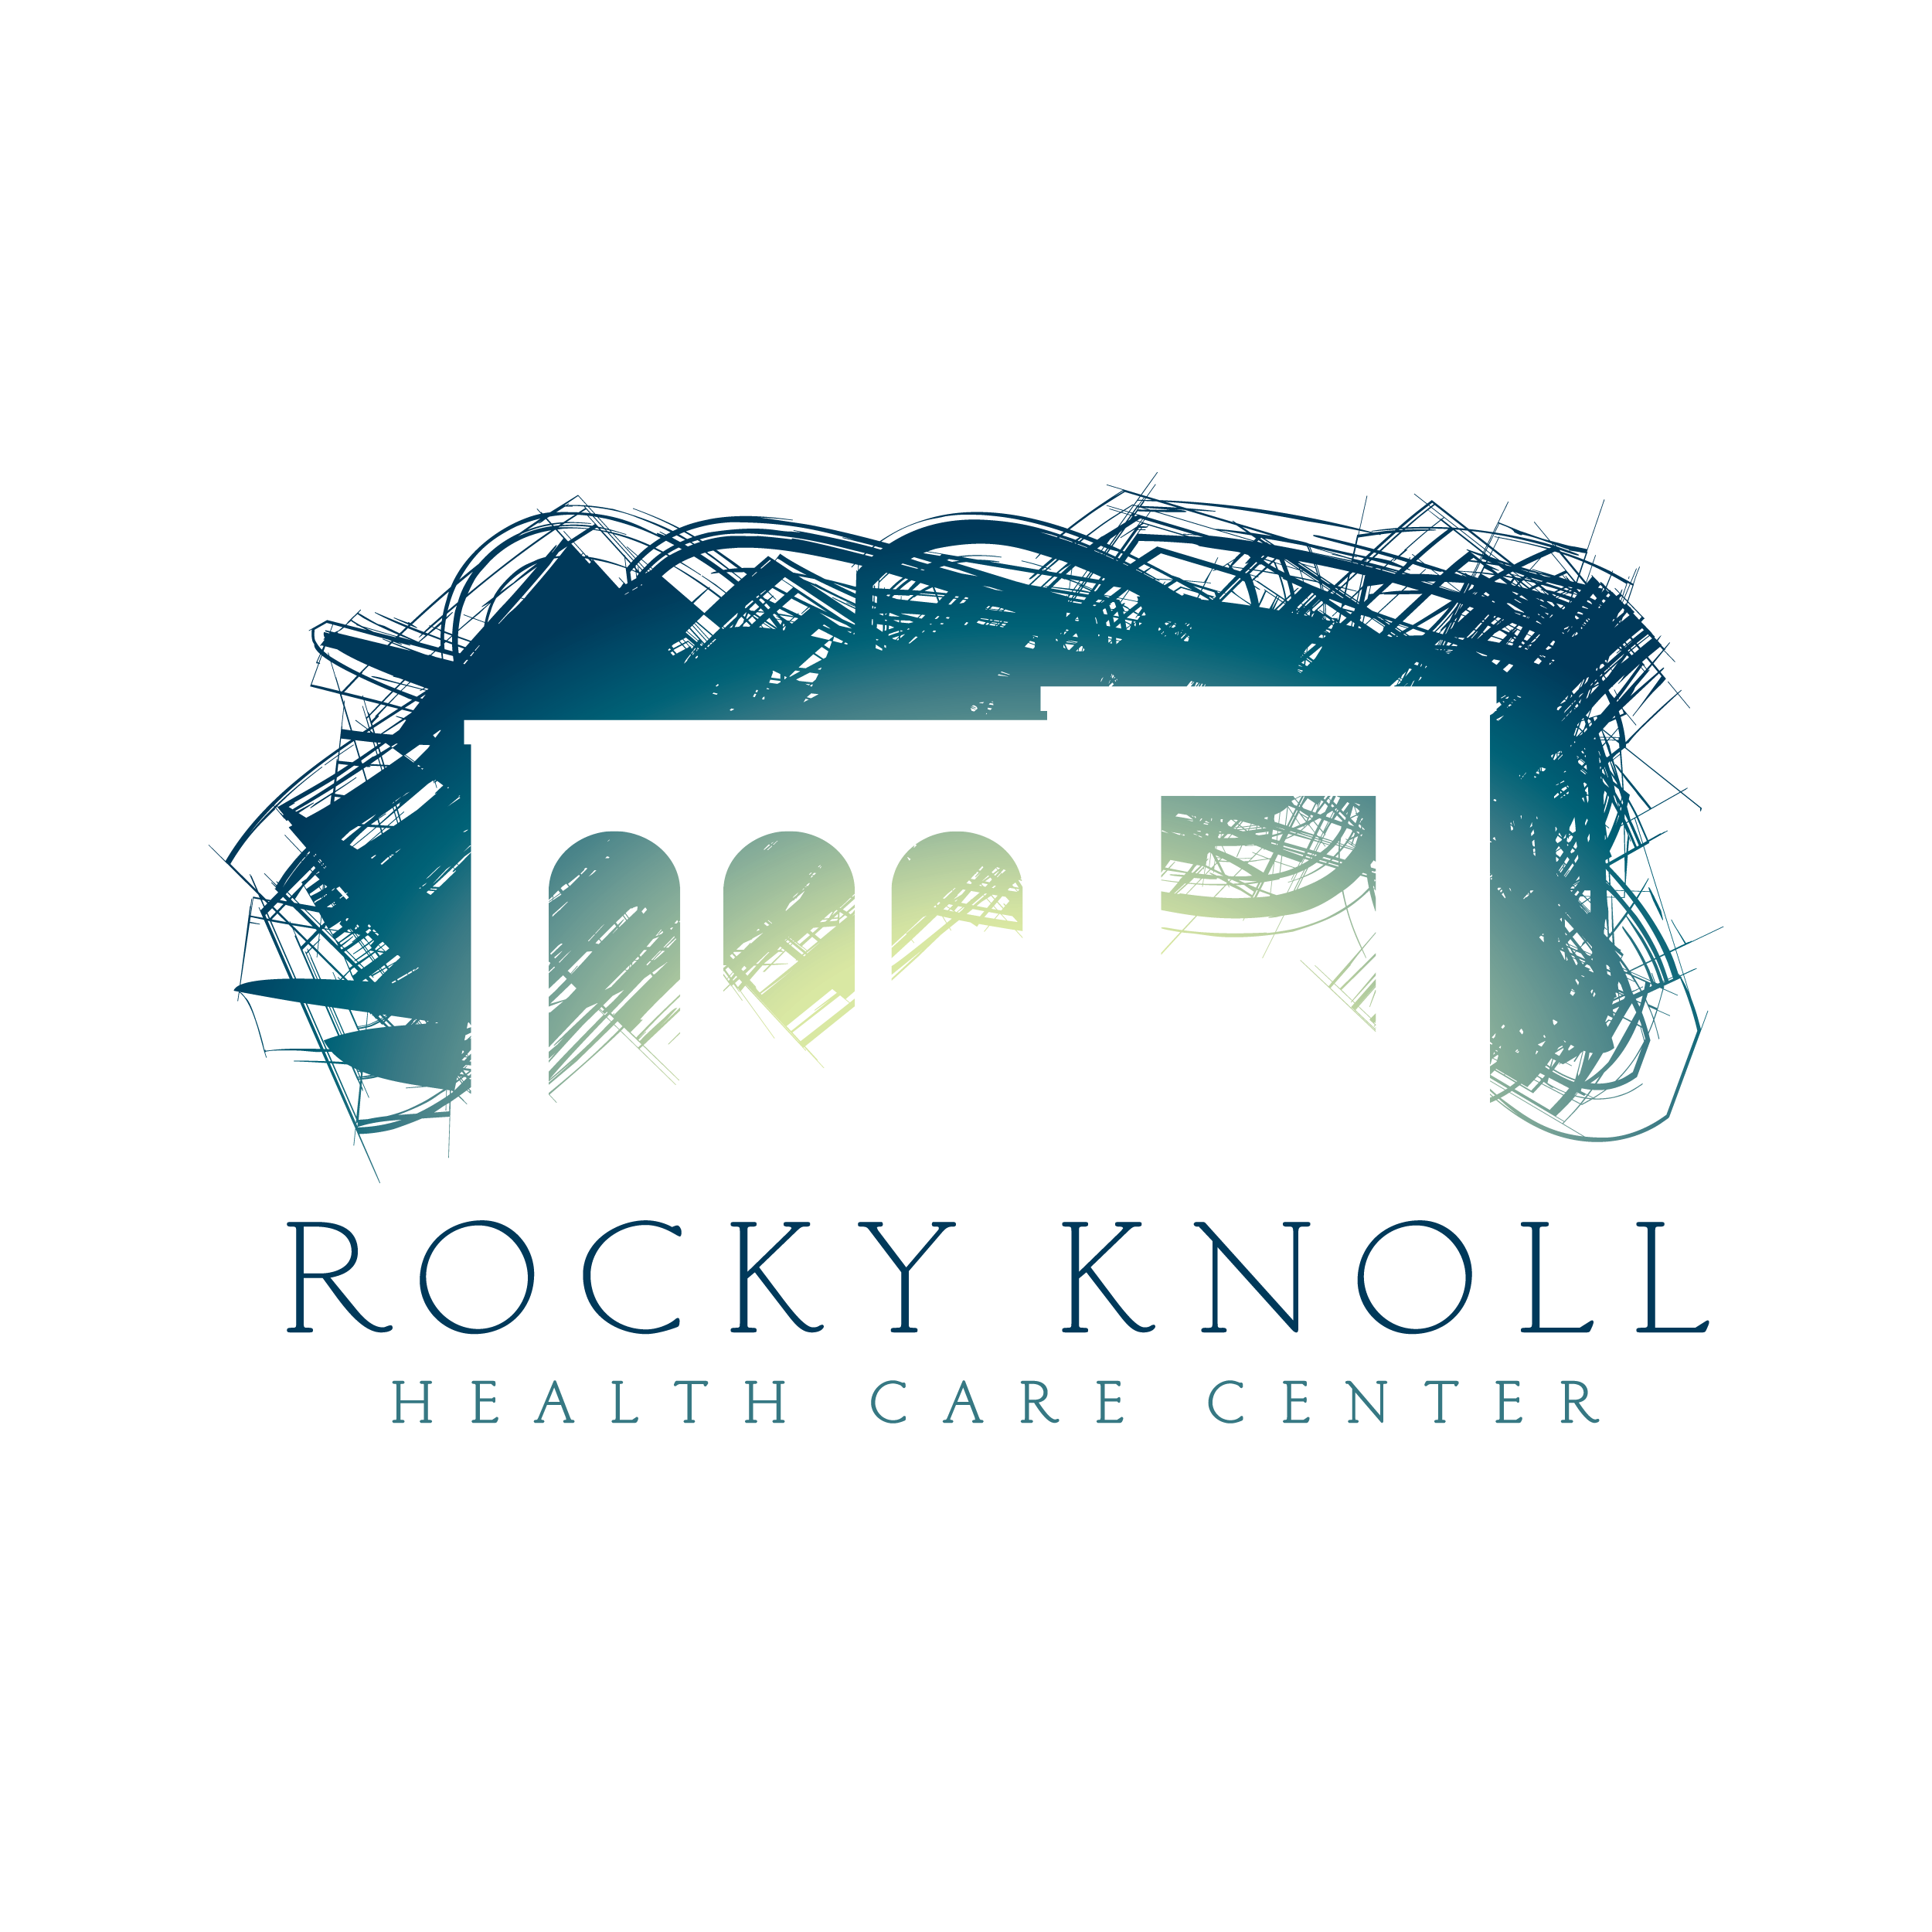 Rocky Knoll Health Care Center